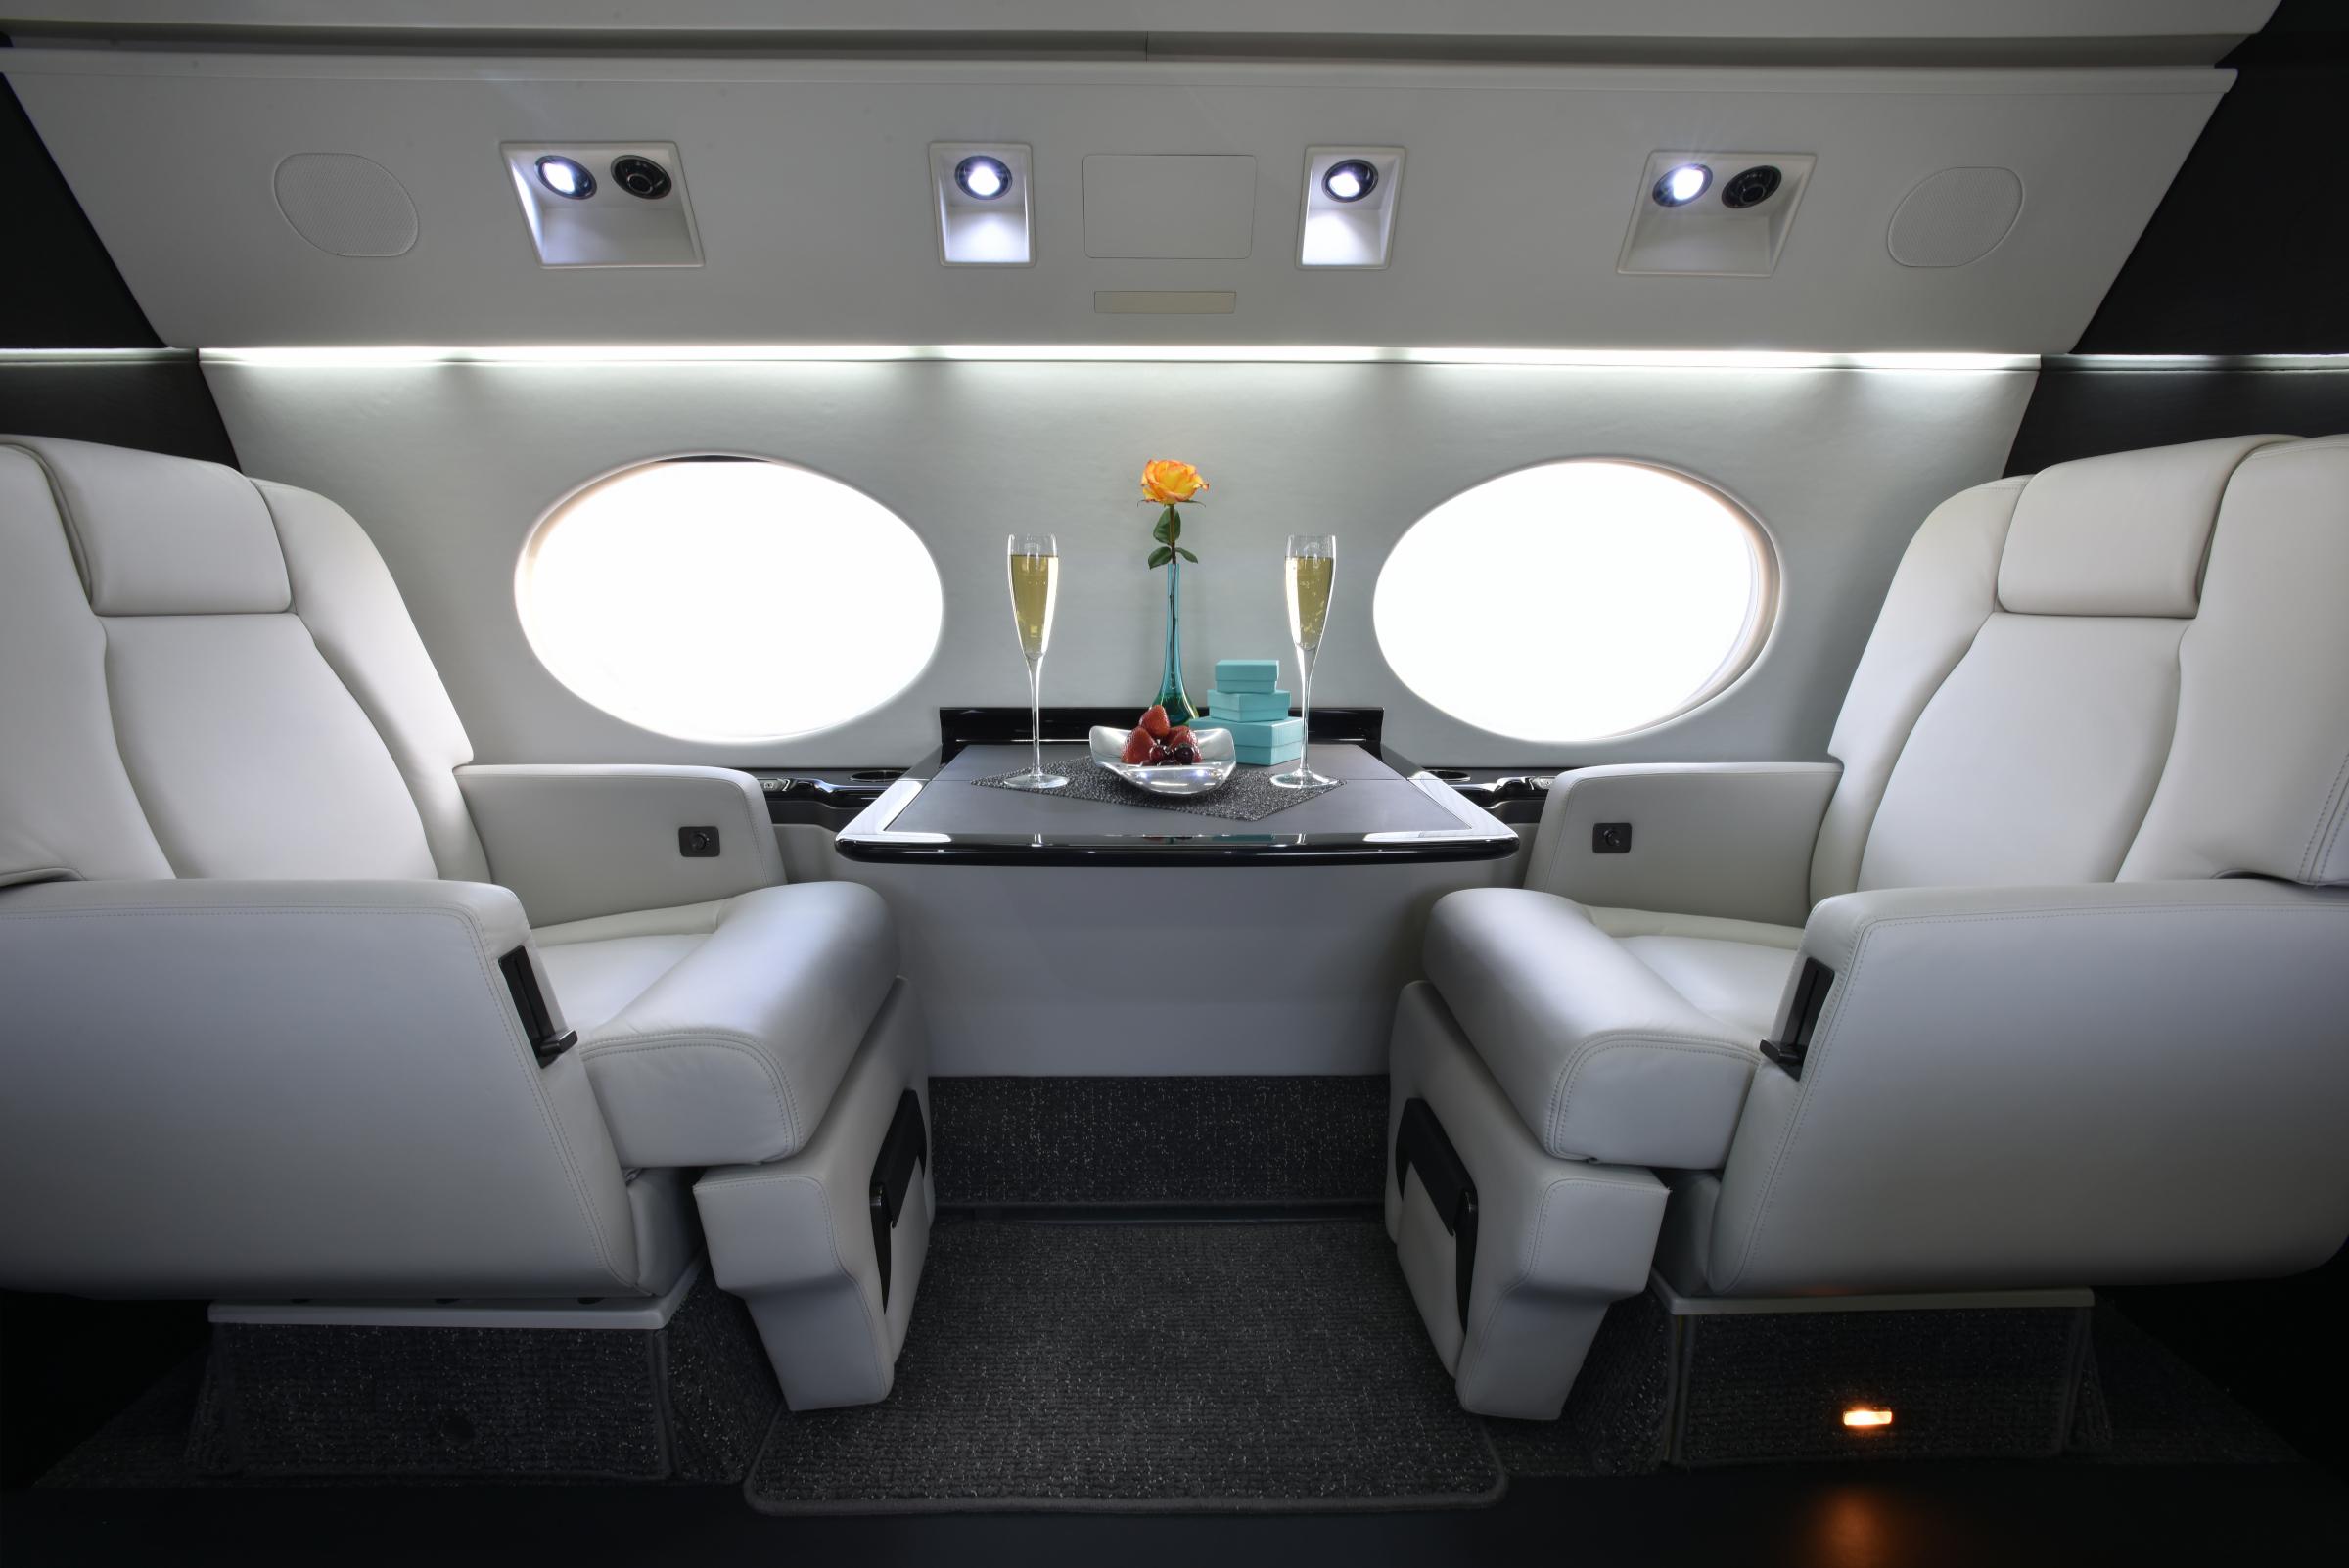 Gulfstream GIV-SP cabin refurbishment by Stevens Aerospace